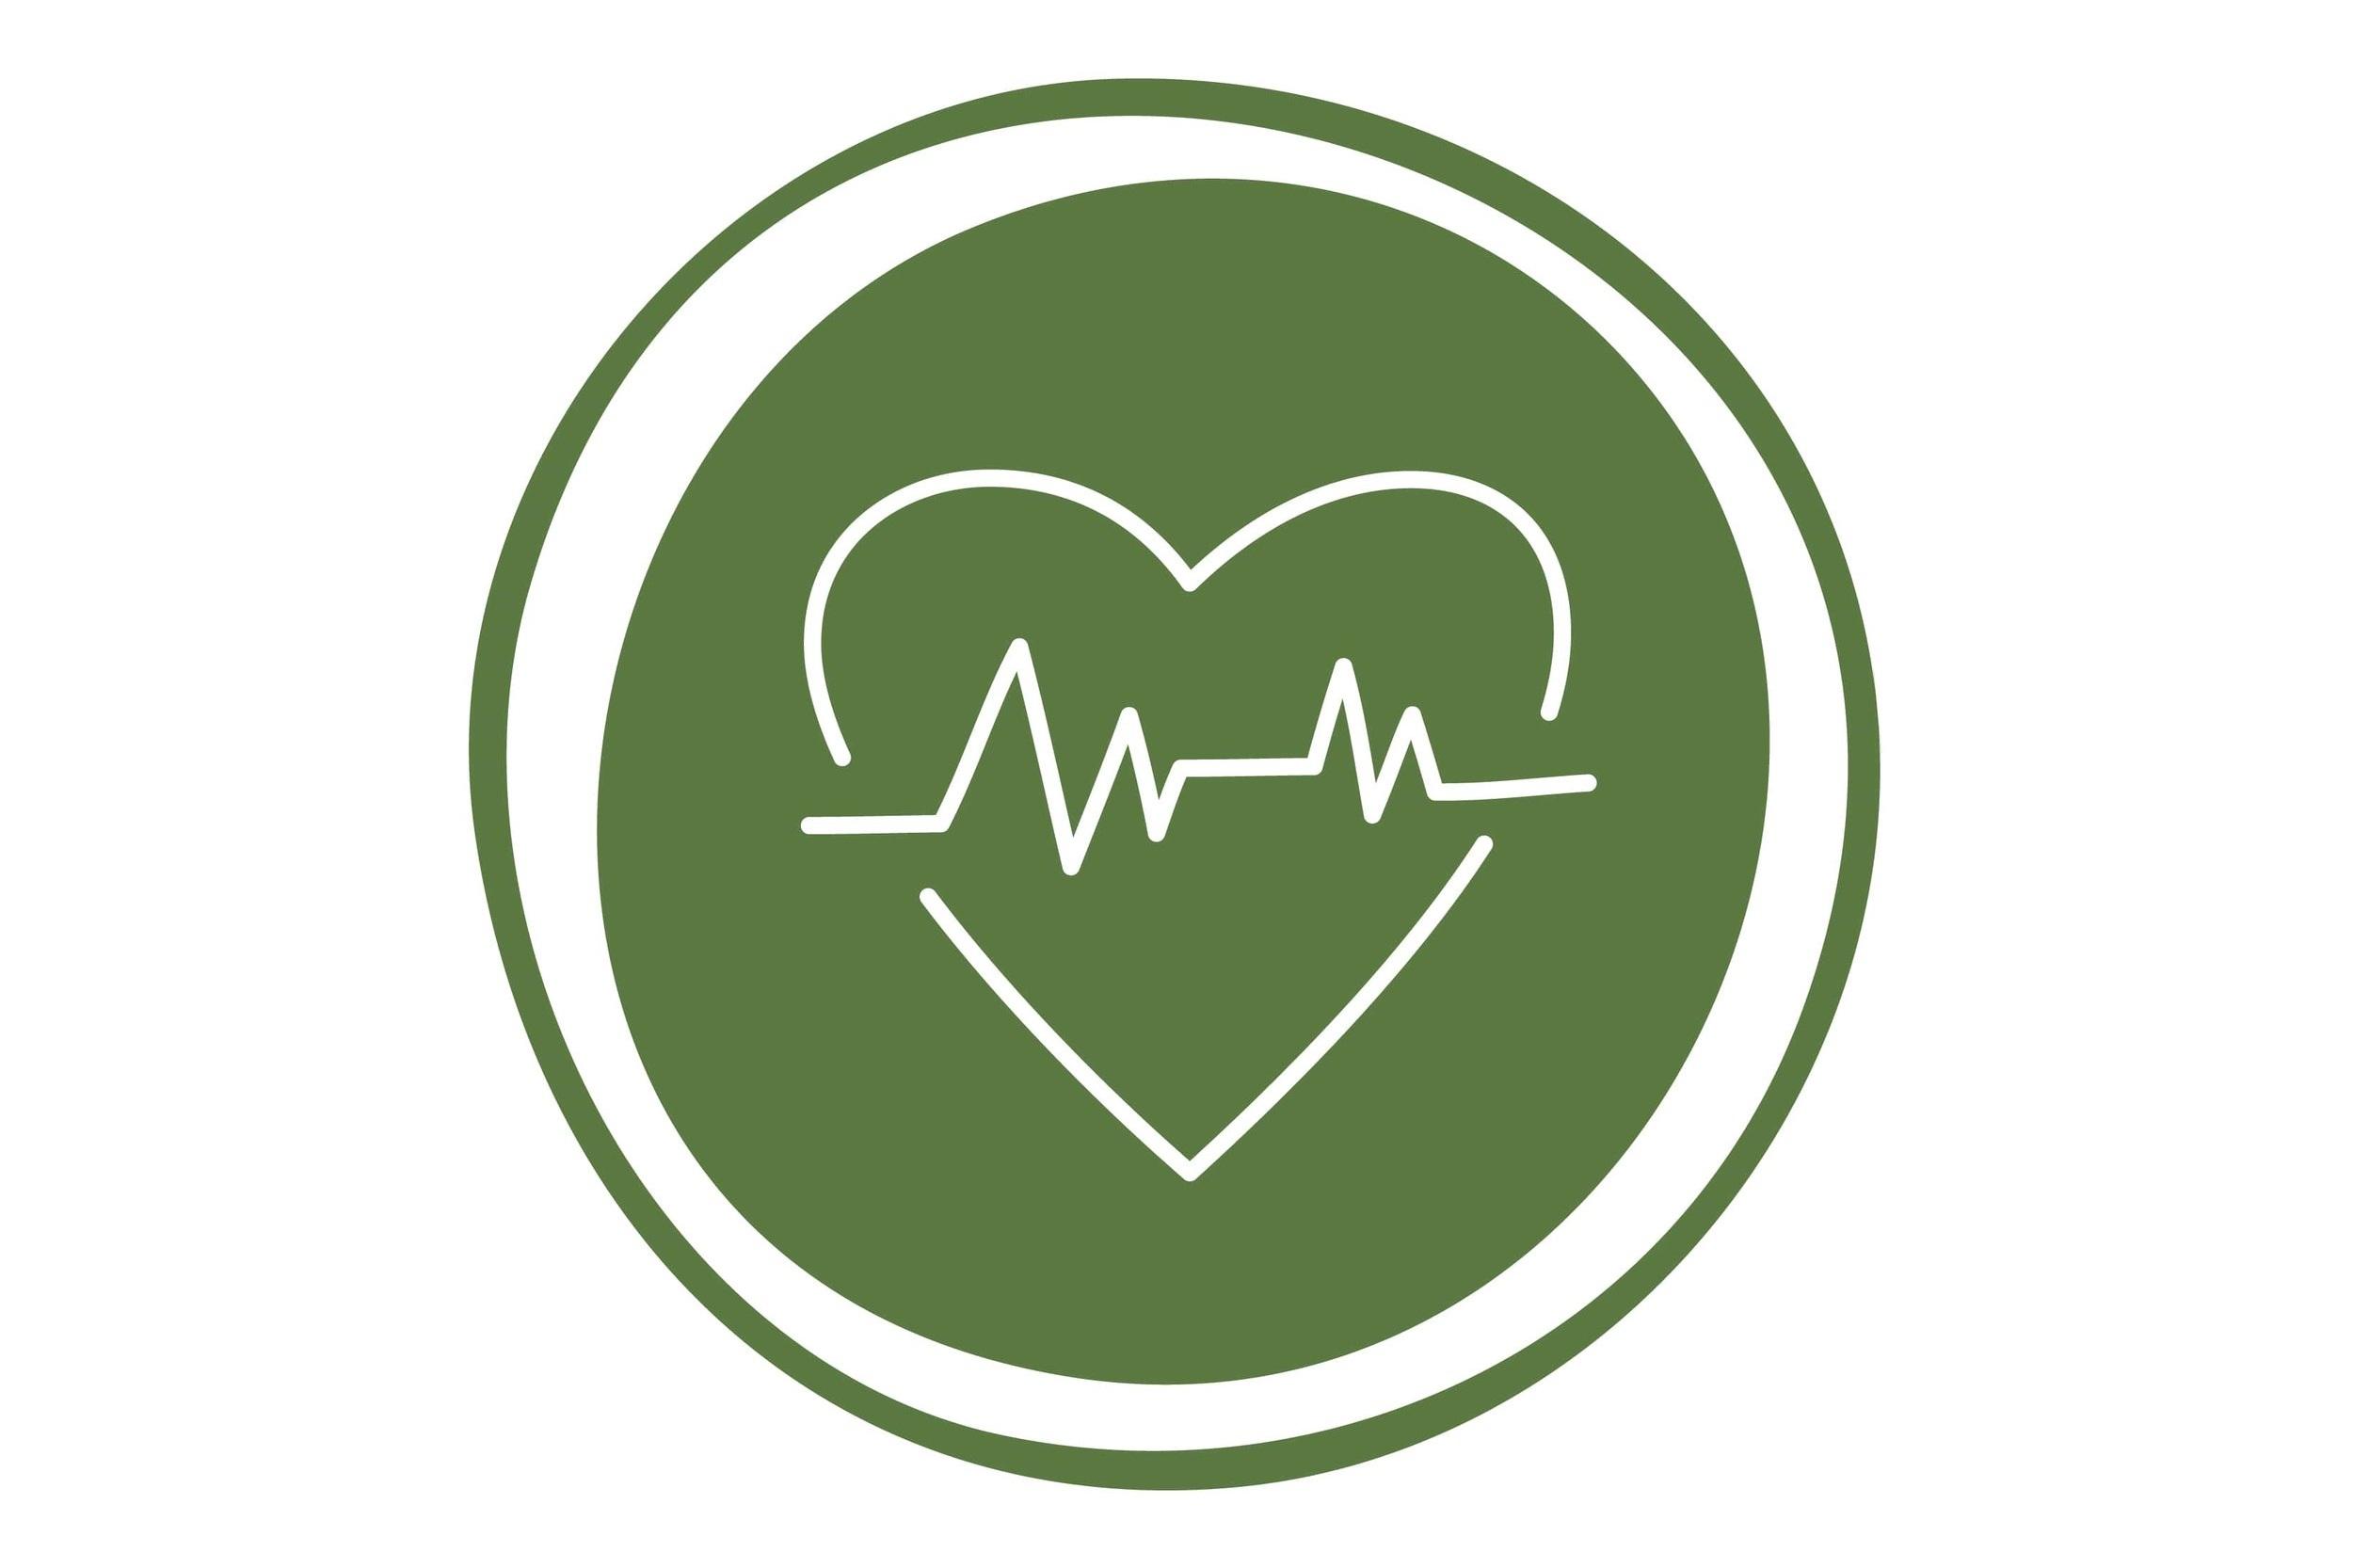 Heart Healthy -